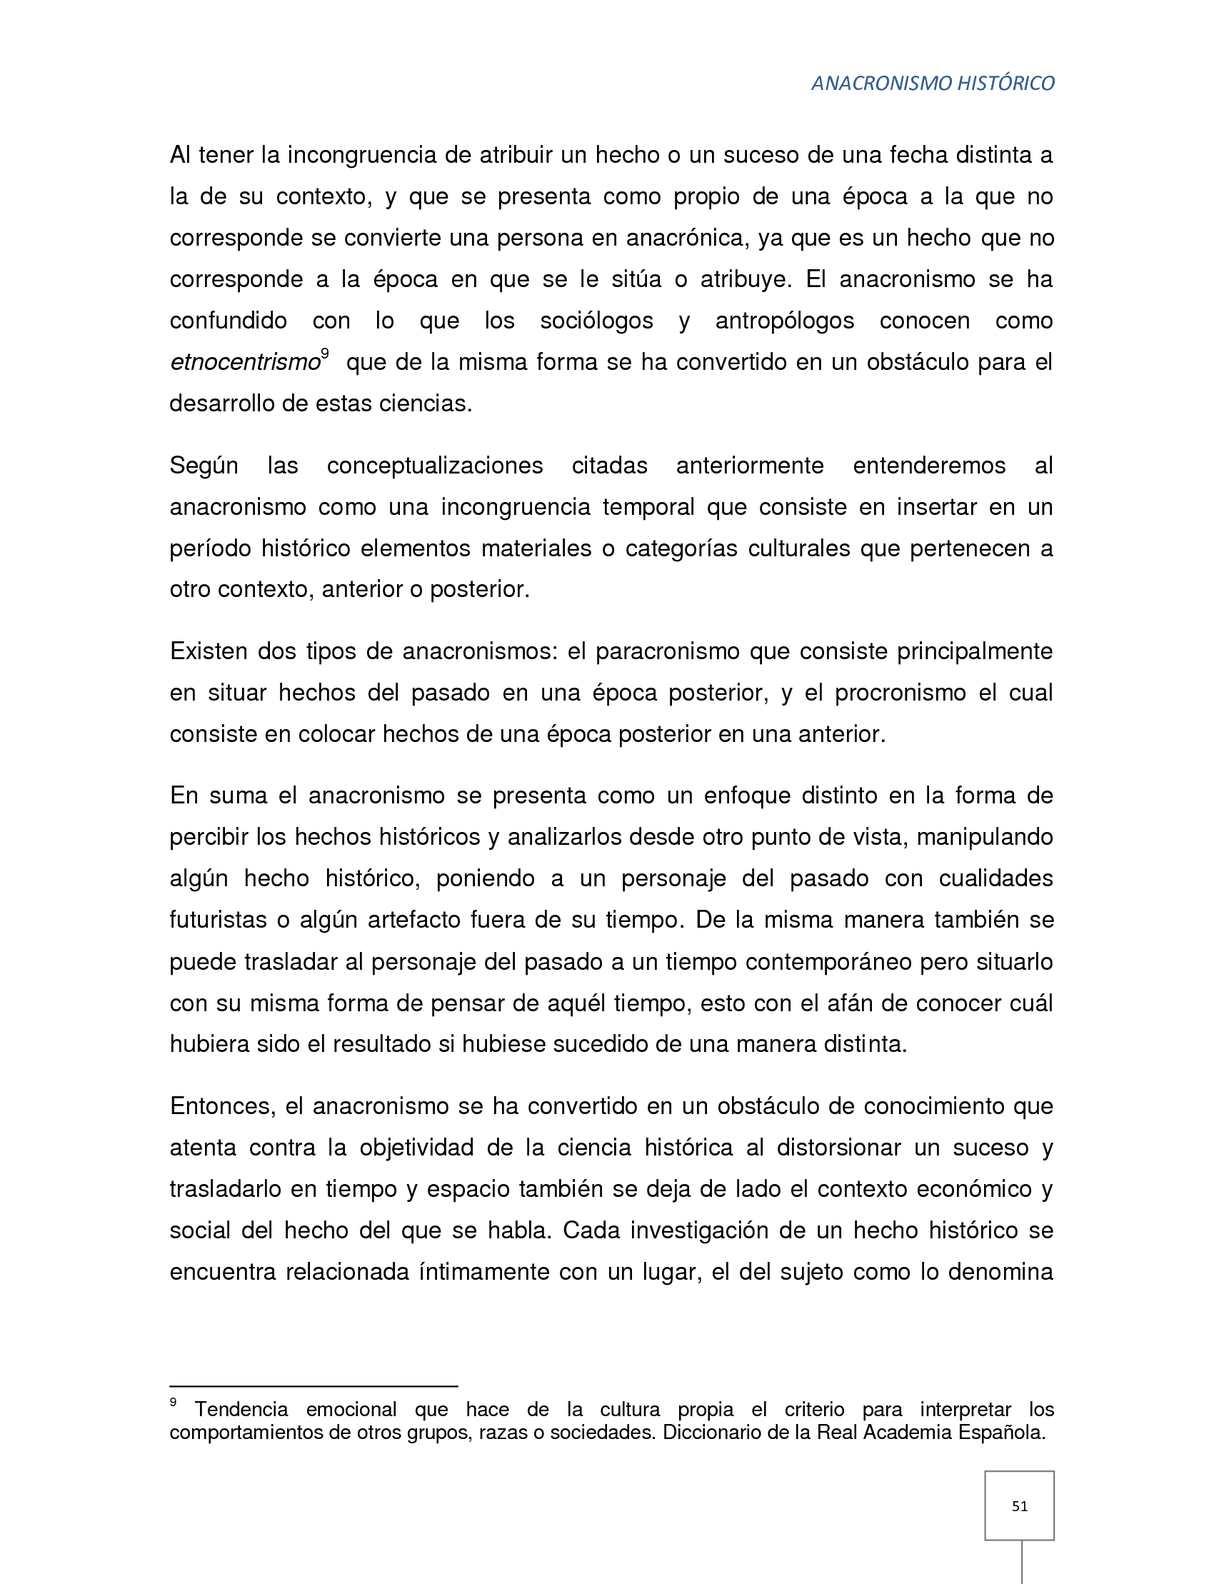 Excepcional Hoja Anacronismo Bandera - hoja de cálculo - msklerose.info